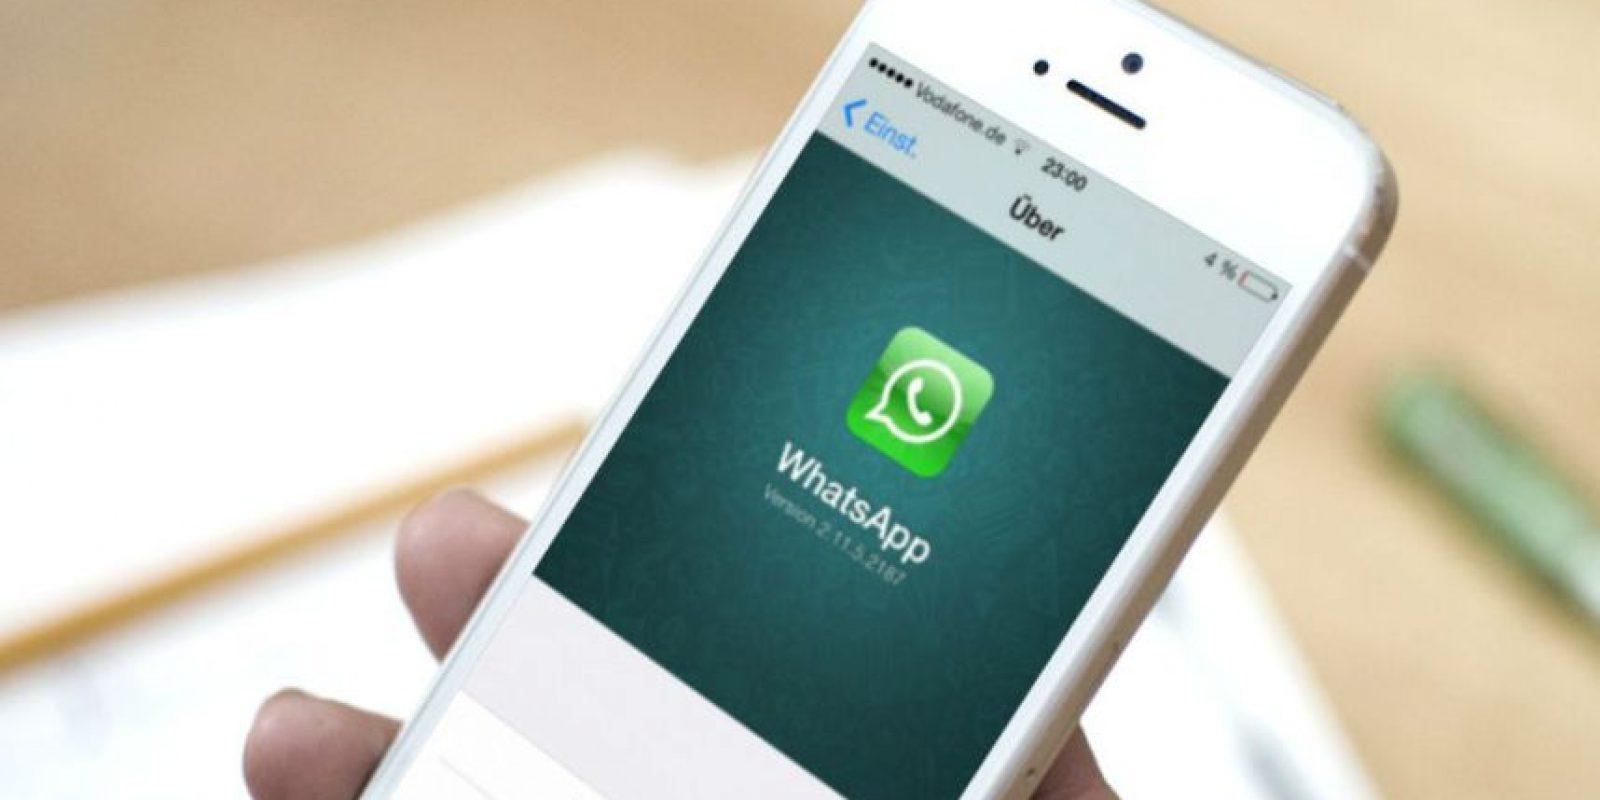 WhatsApp se actualiza con interesantes novedades. Foto:vía Tumblr.com